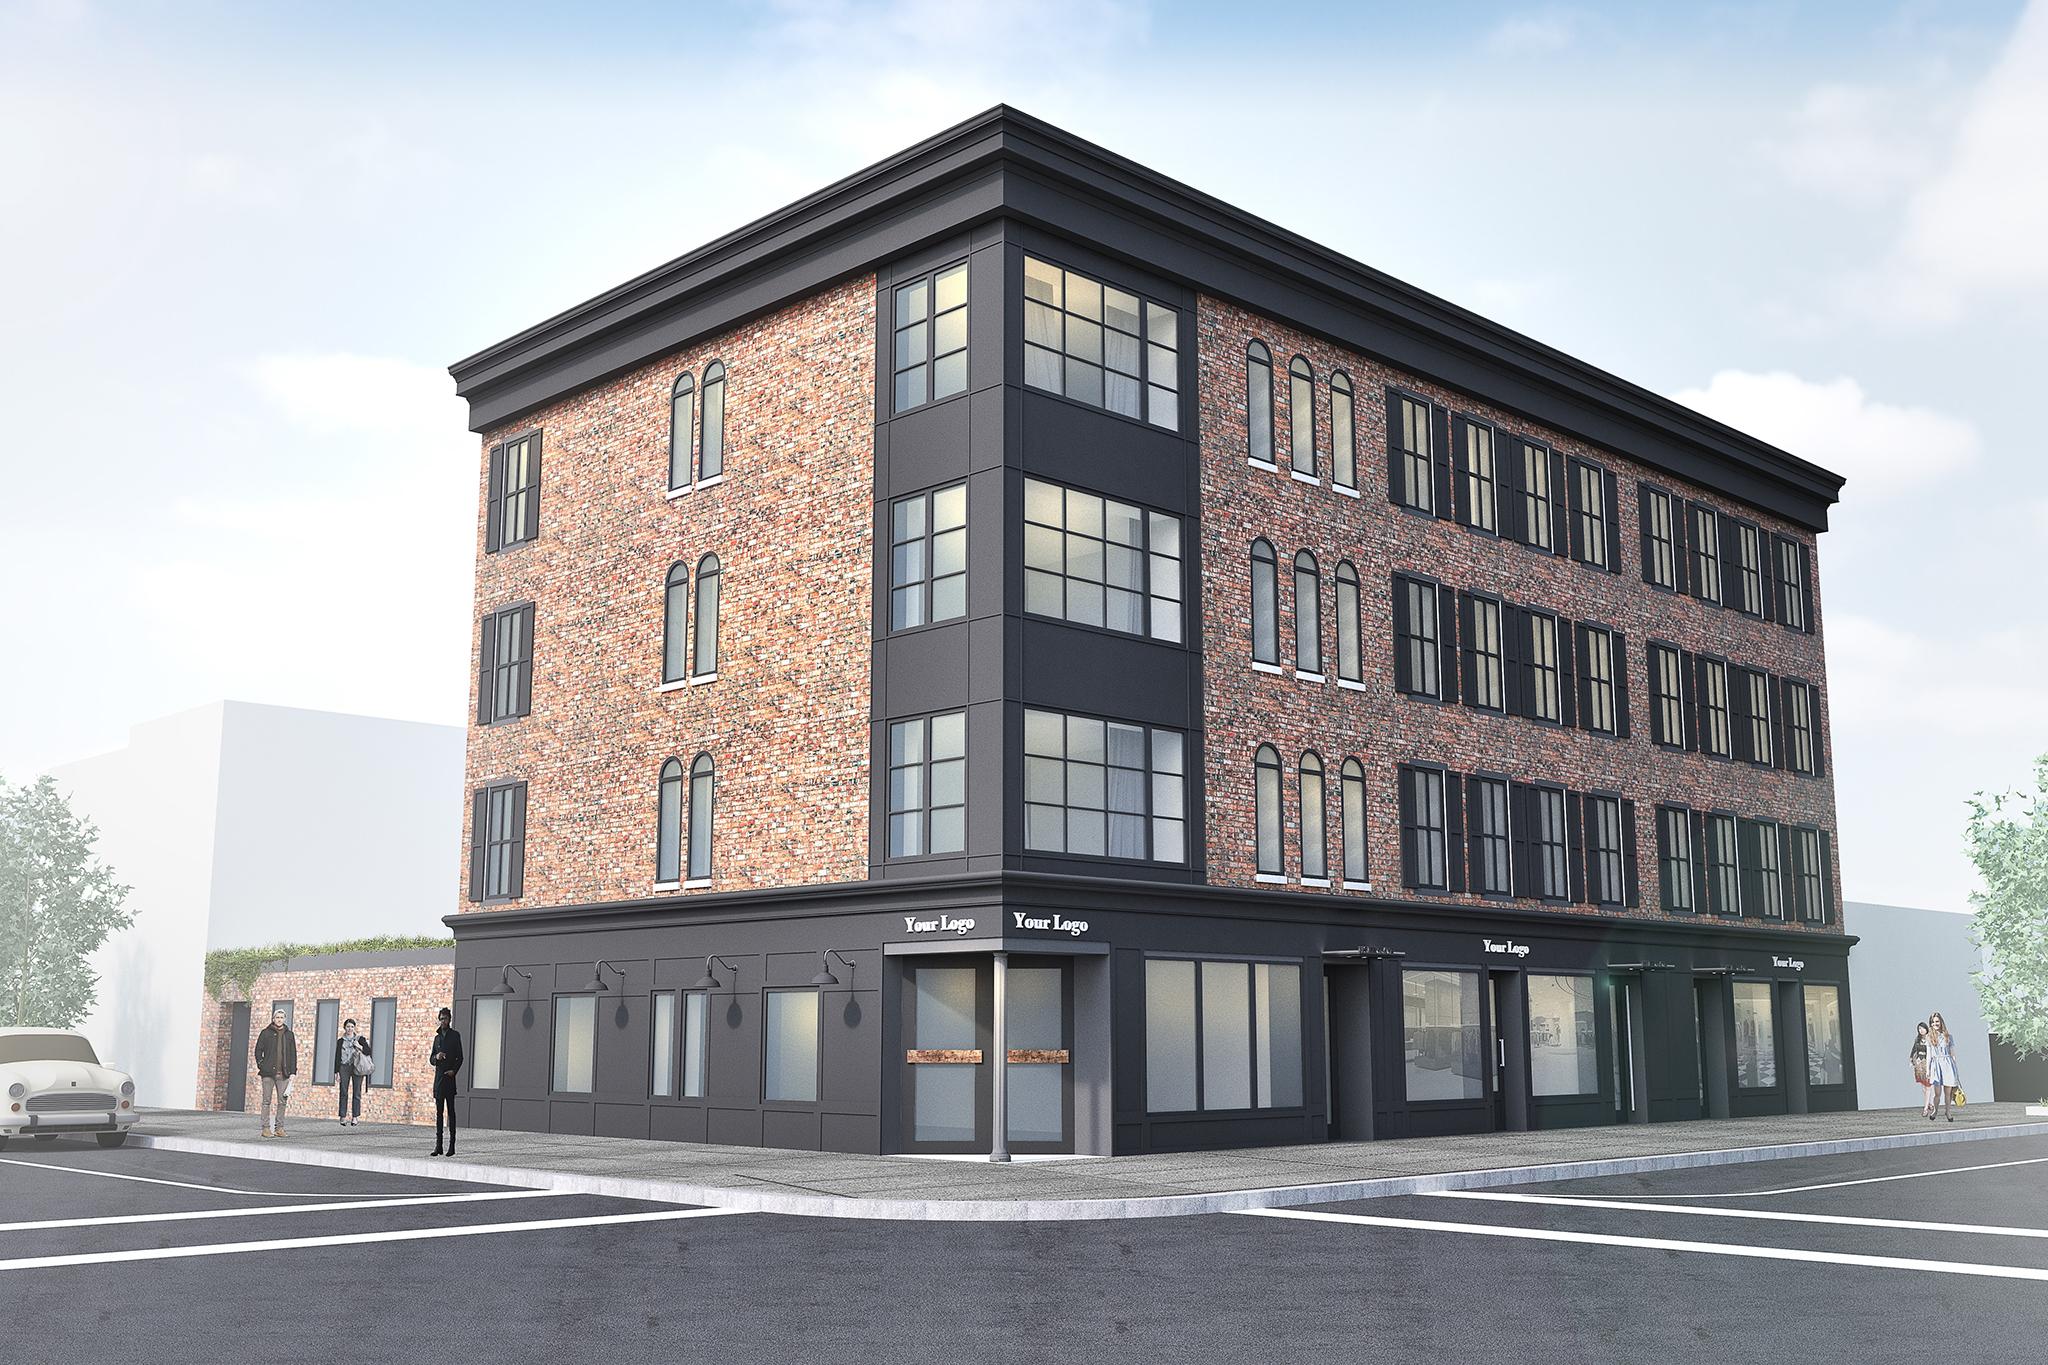 119-123 Kent Avenue, rendering by Input Creative Studio